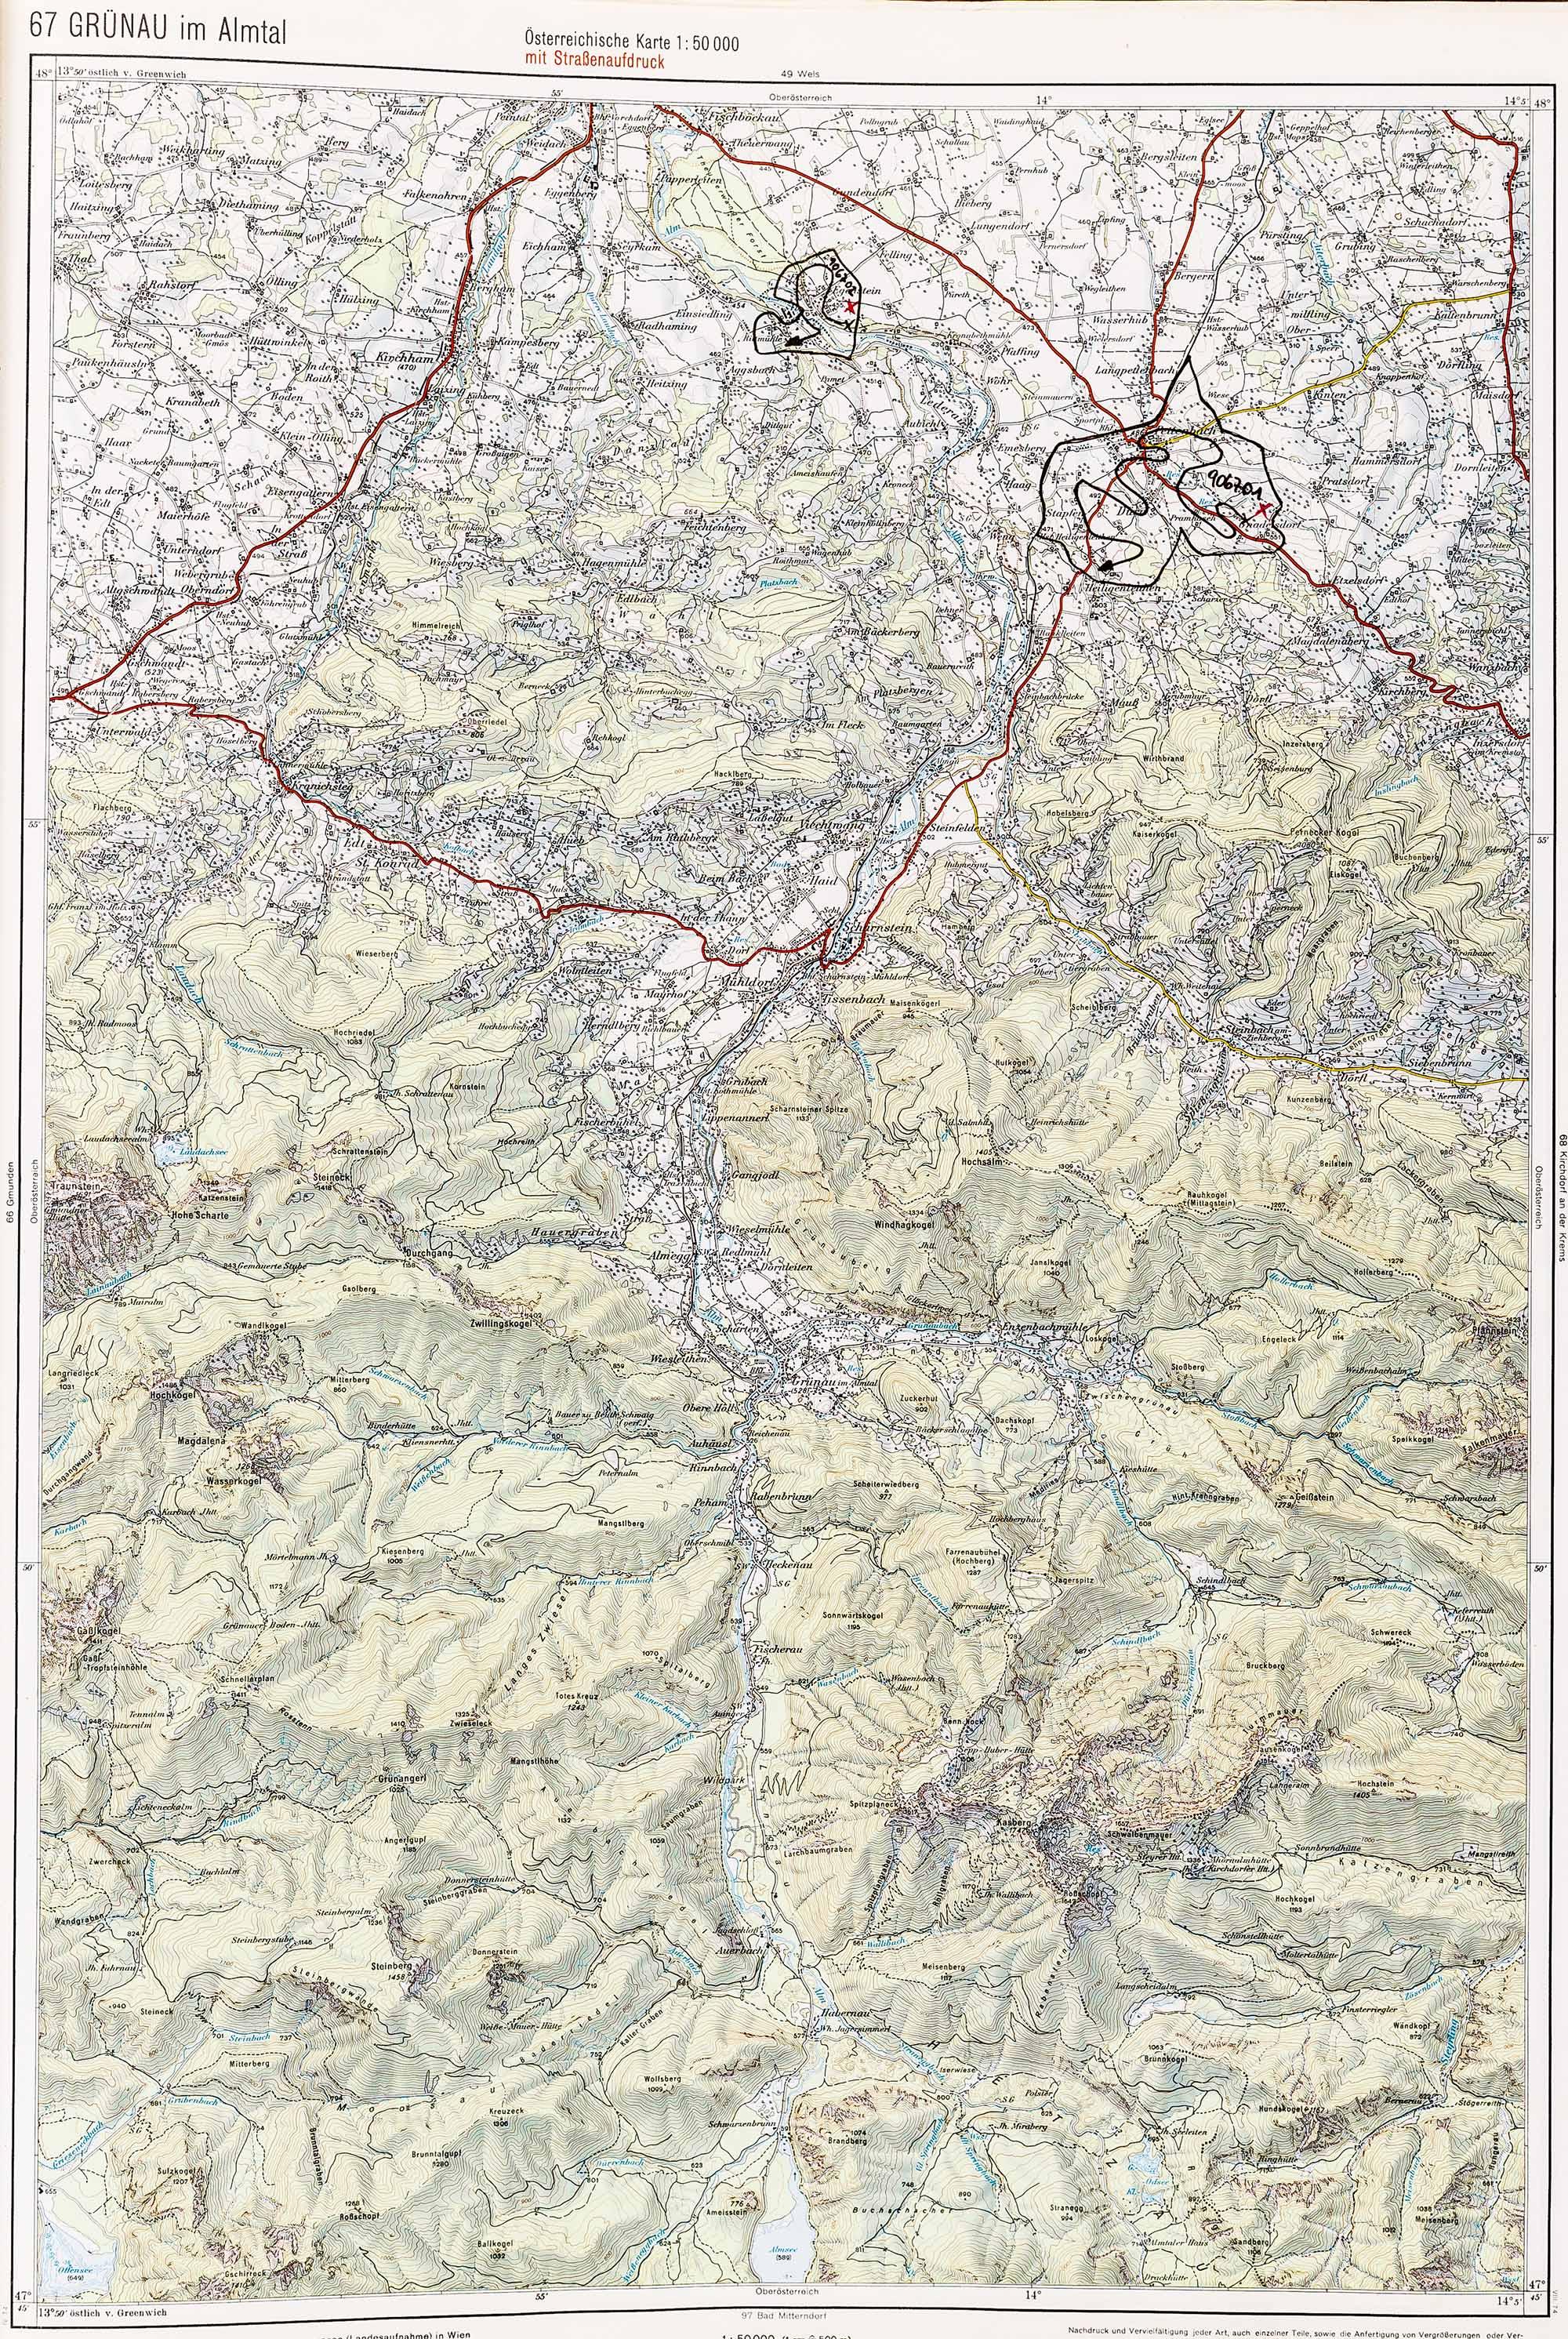 1975-1979 Karte 067